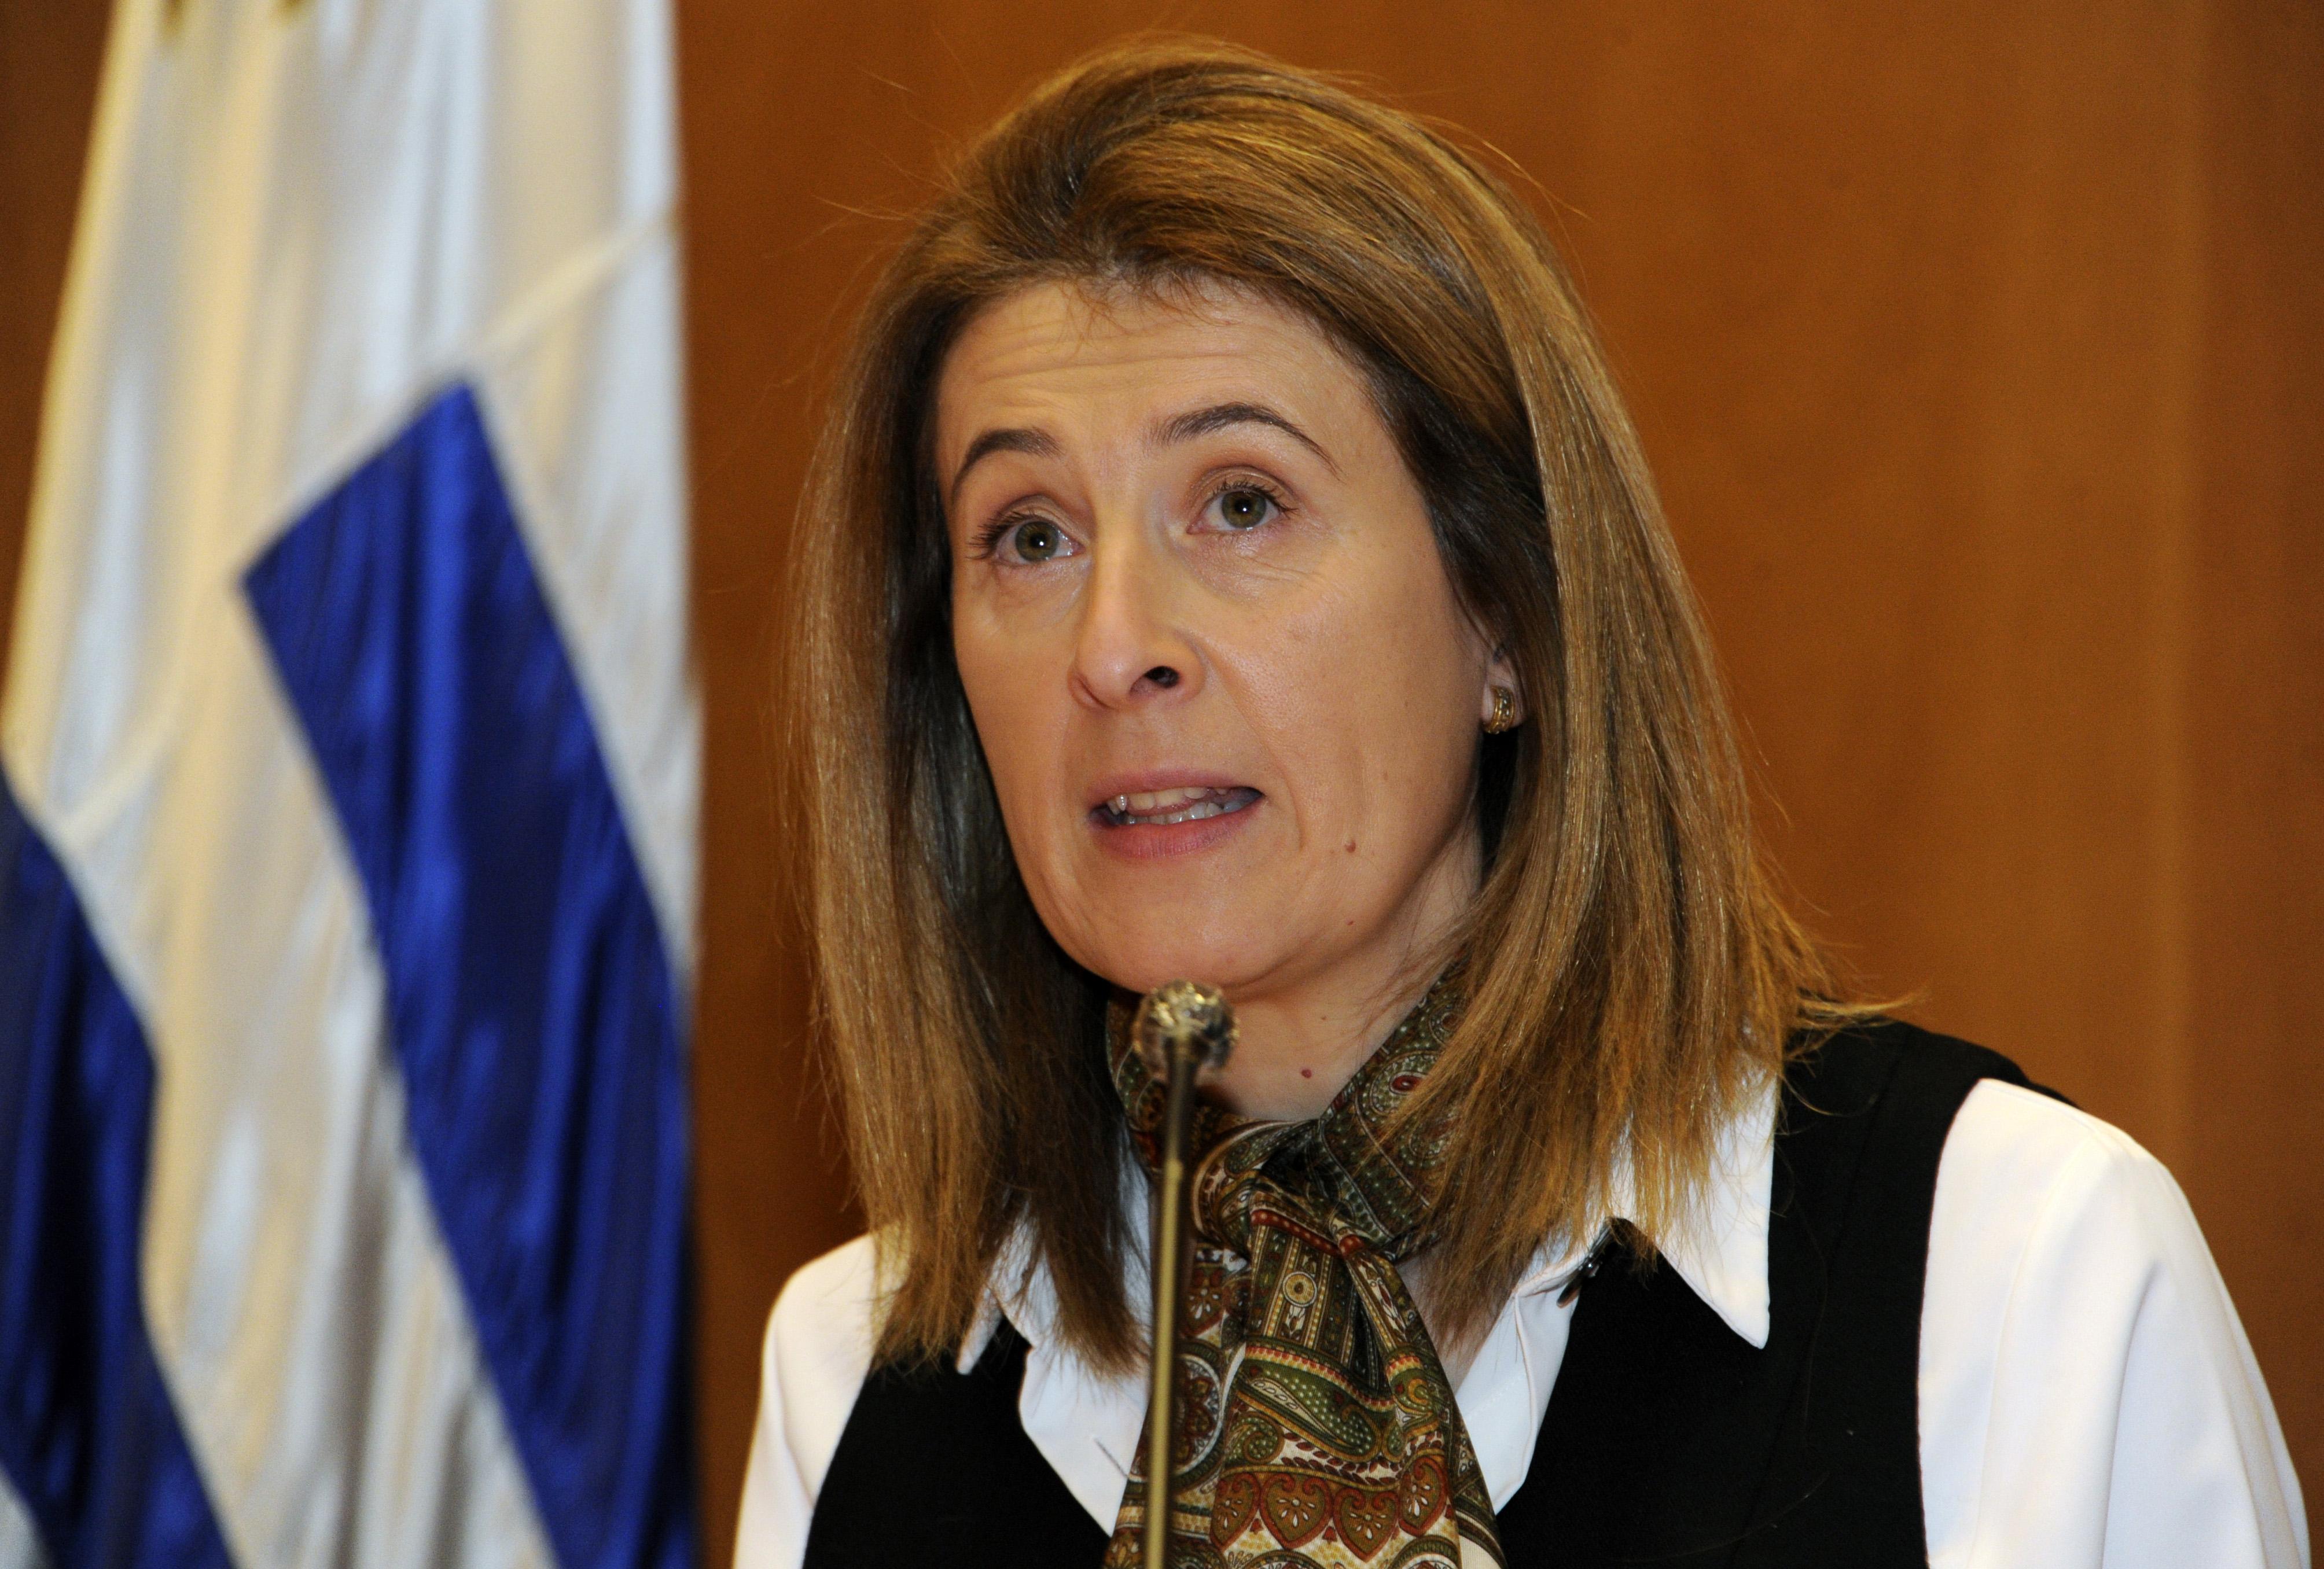 Directora general del MGAP, Fernanda Maldonado